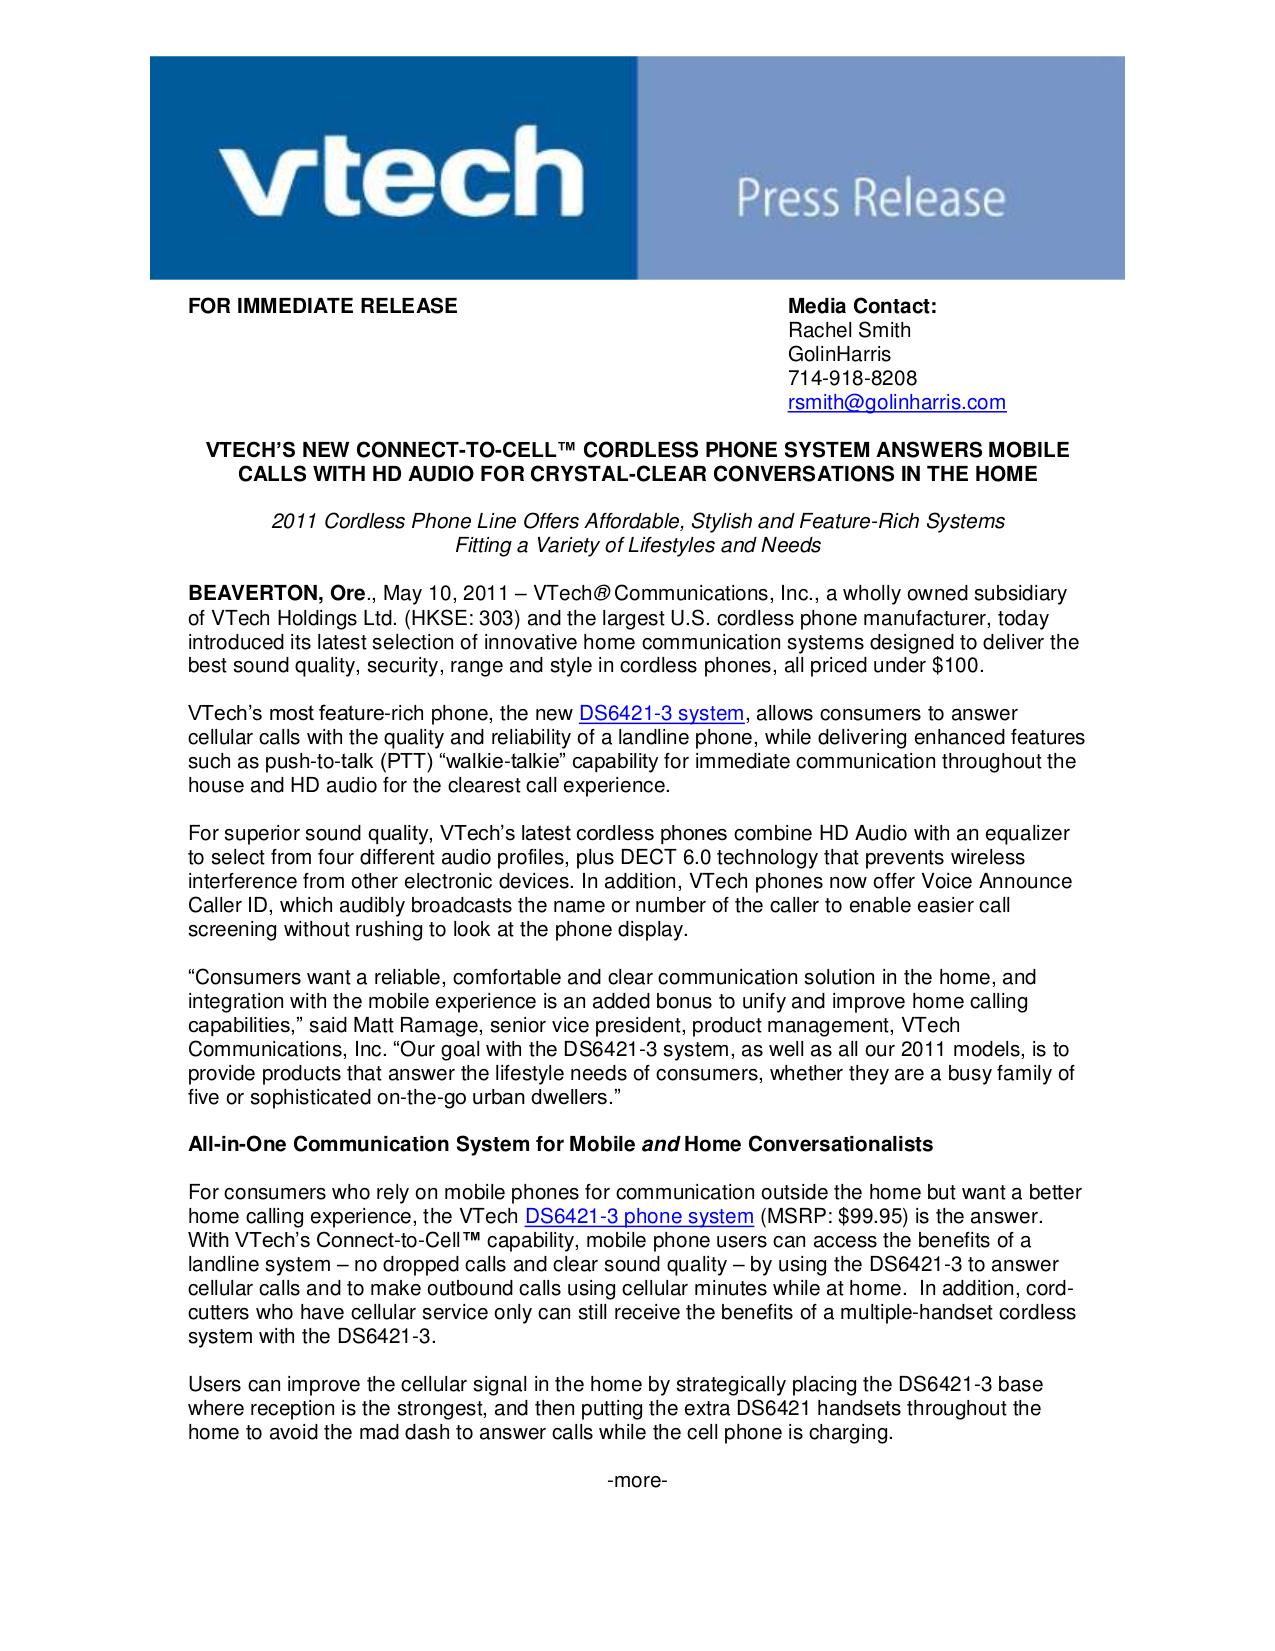 pdf for Vtech Telephone CS6429-3 manual